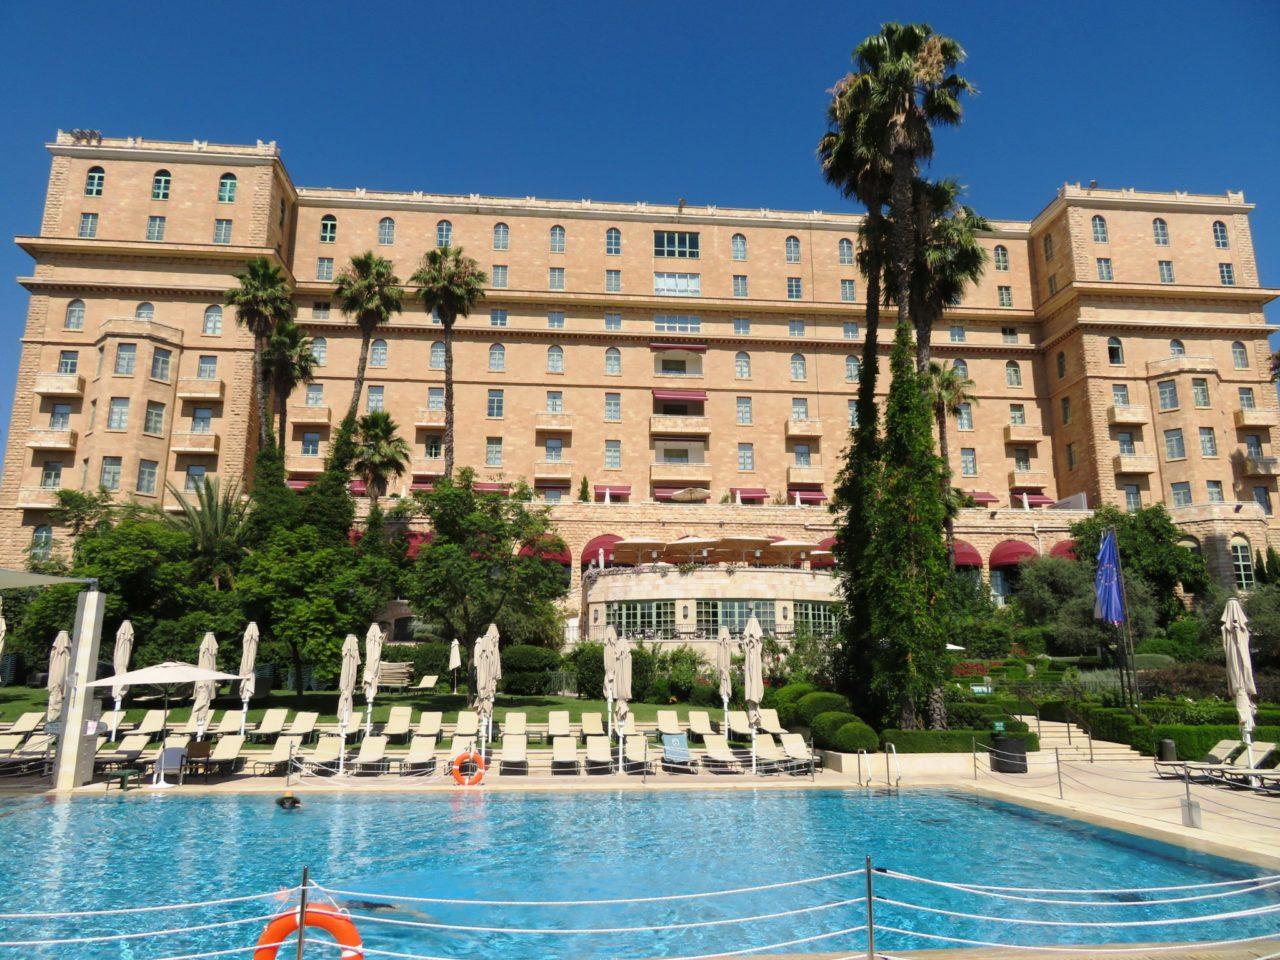 Vacationing in Israel ... The King David Hotel Jerusalem